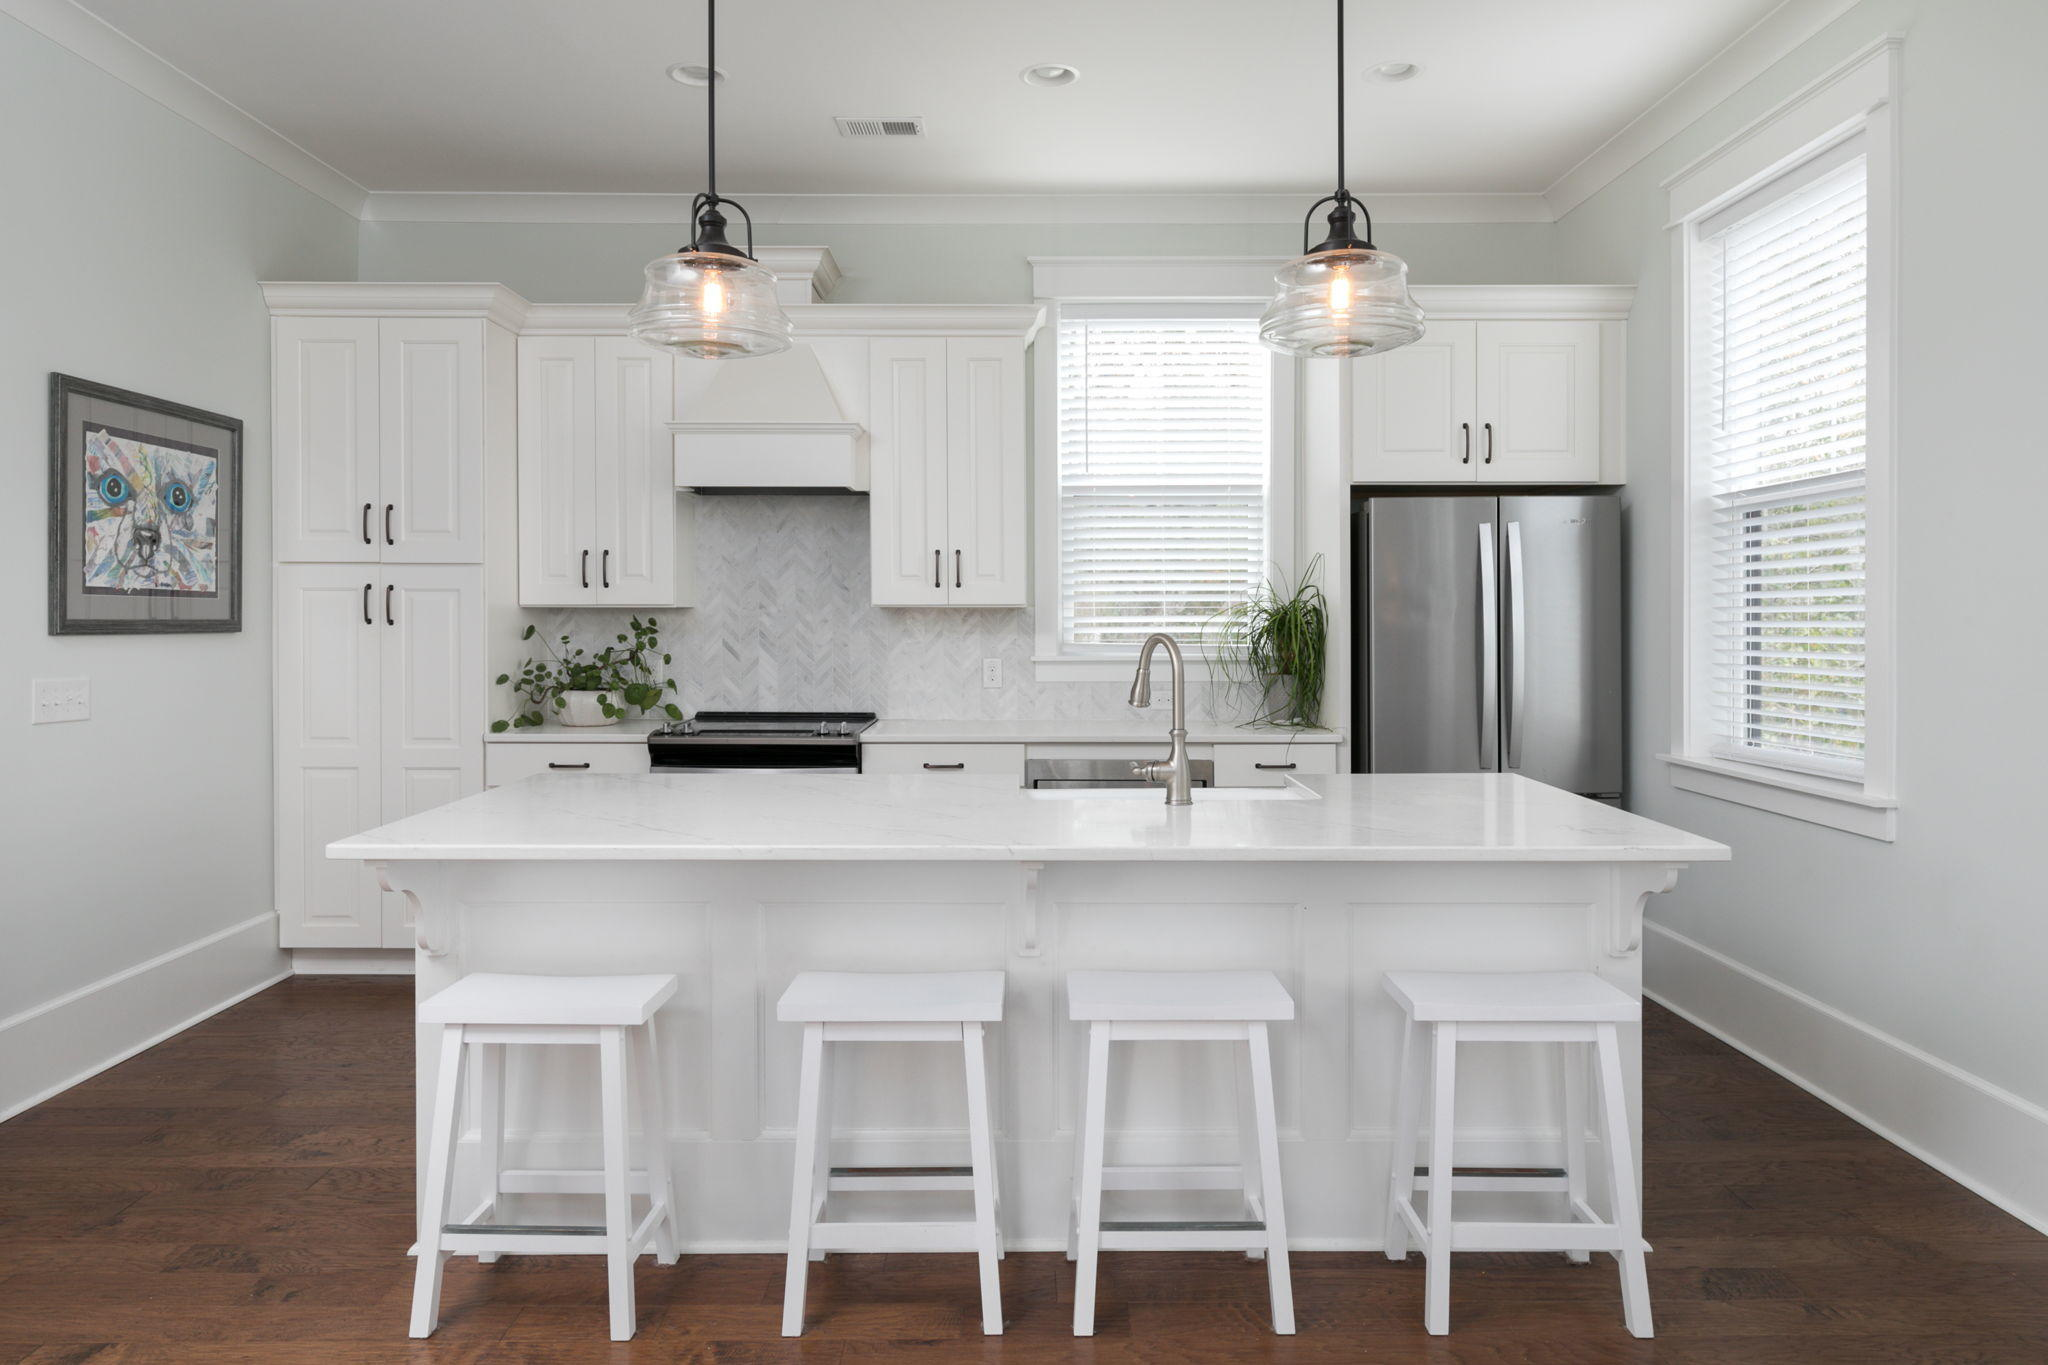 Sullivans Pointe Homes For Sale - 954 Key Colony, Mount Pleasant, SC - 31